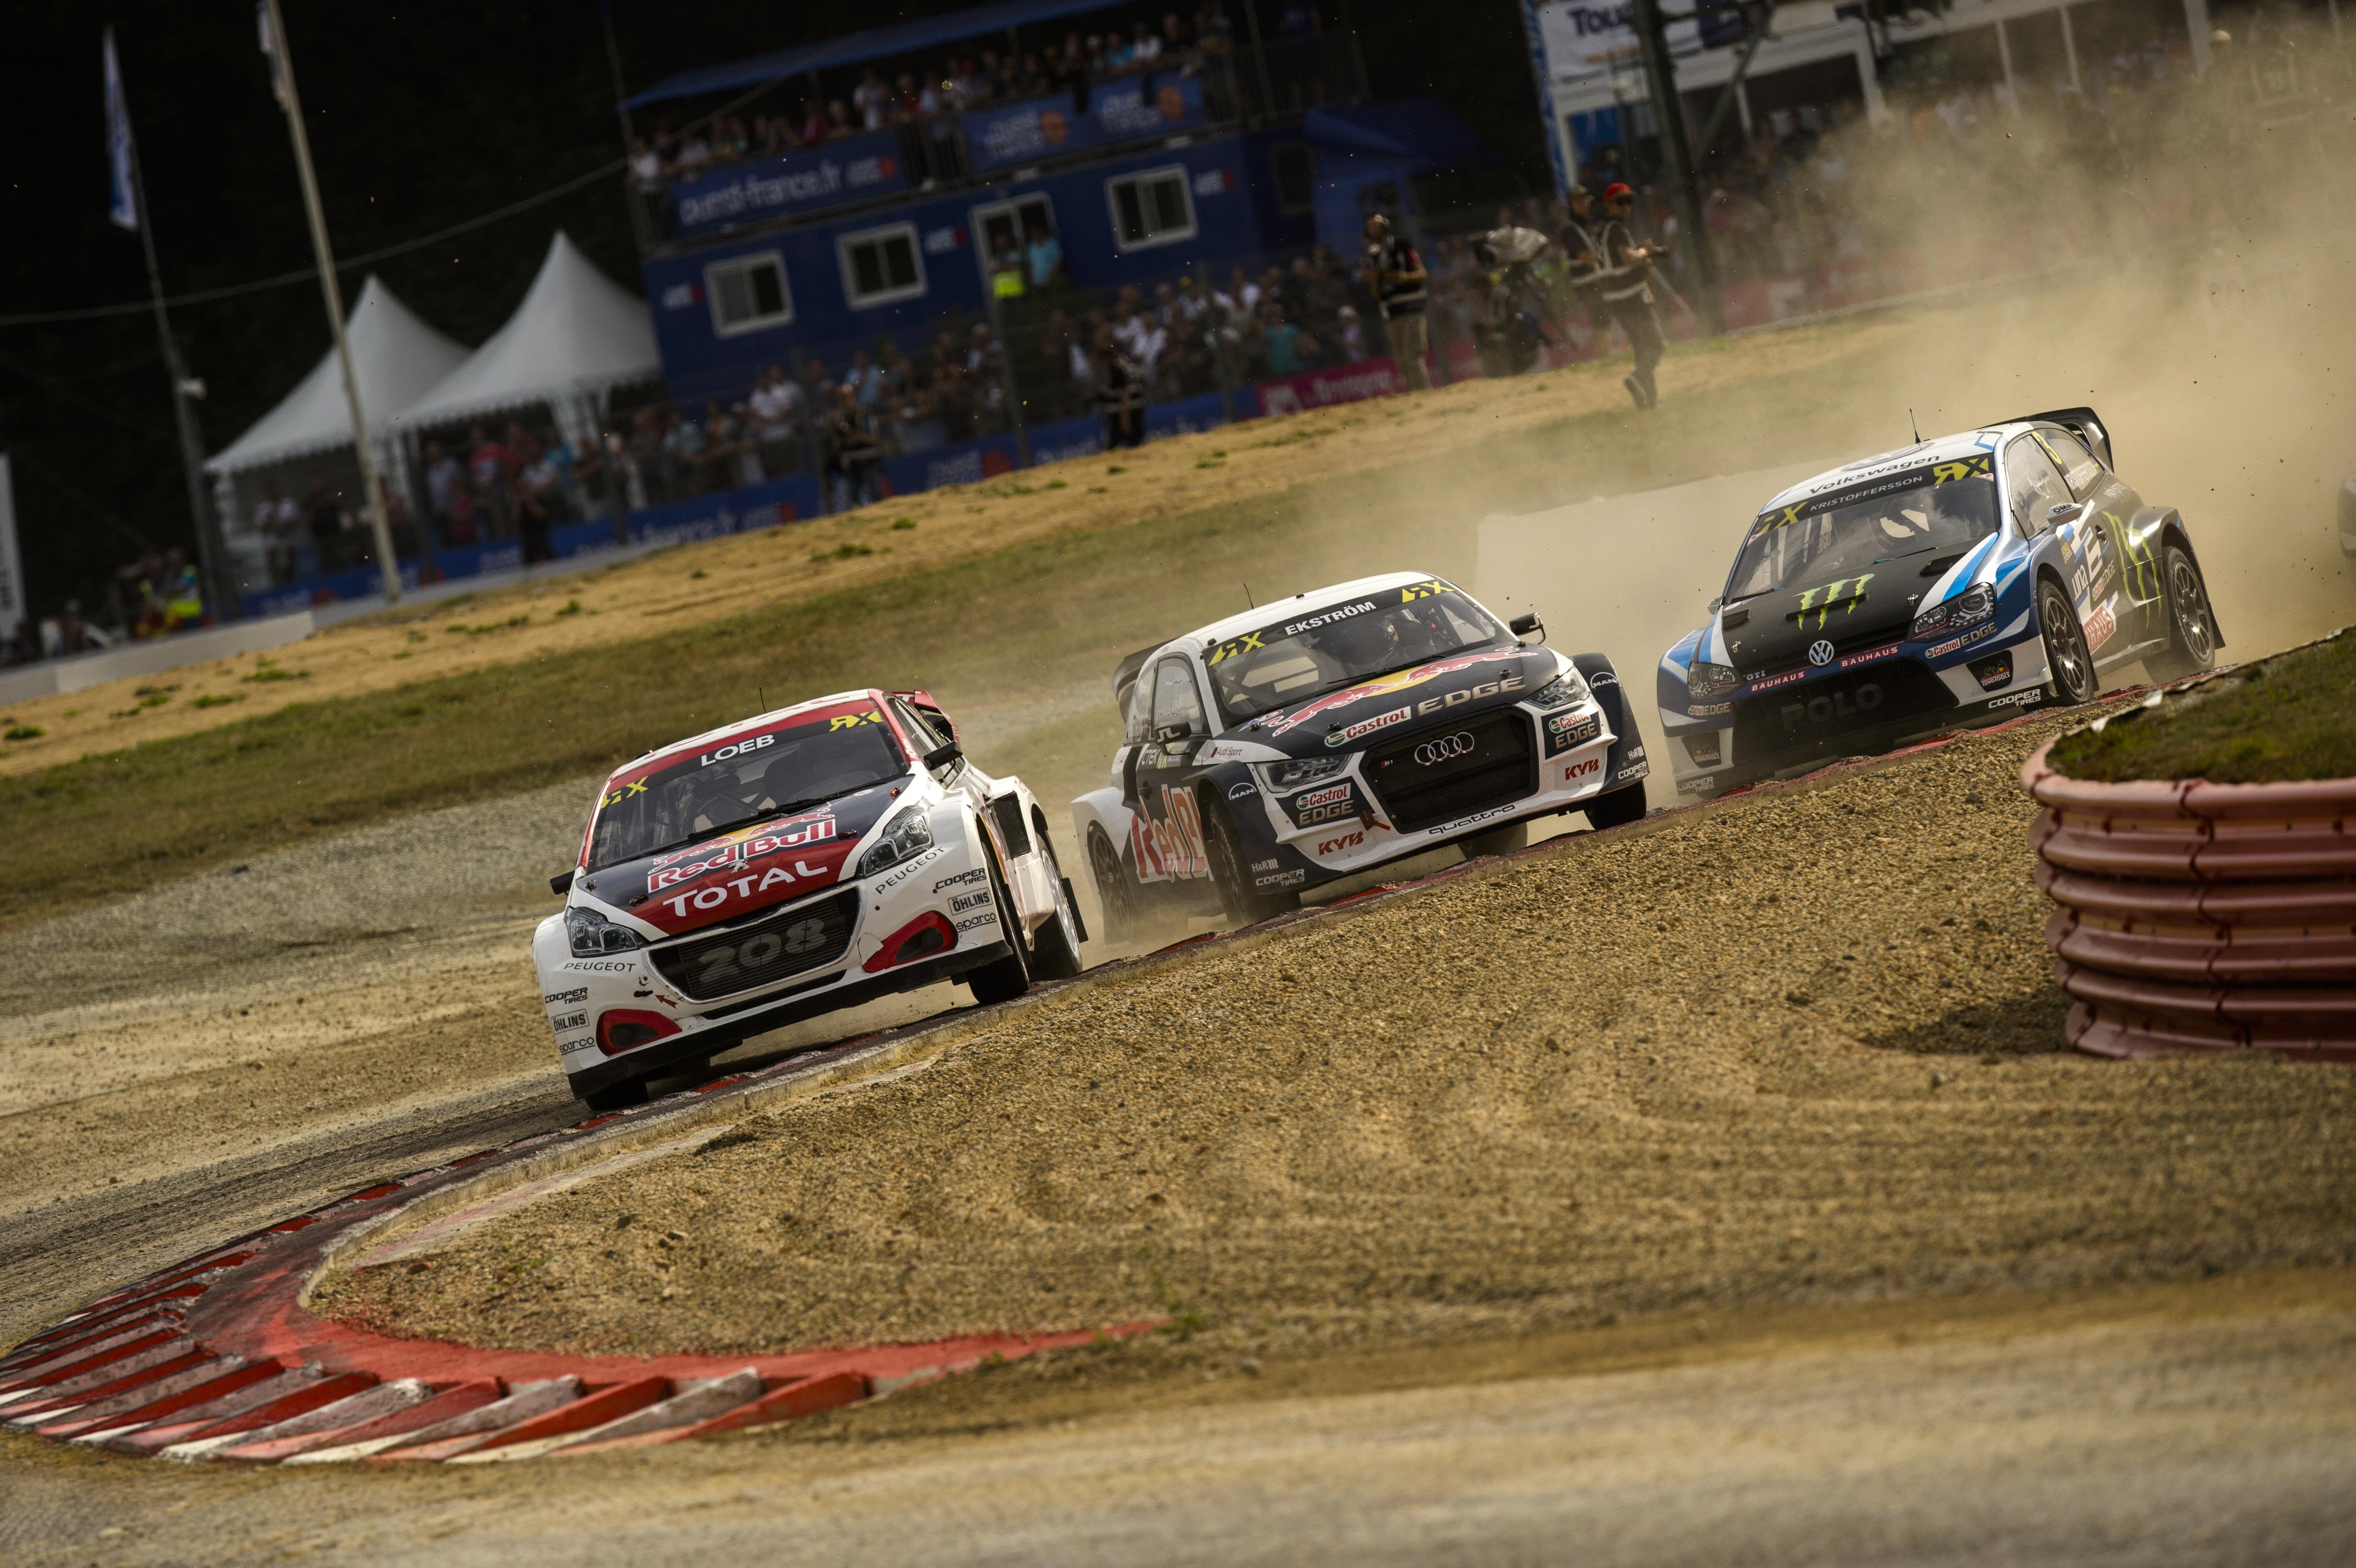 Calendrier Autocross Ouest 2020.Rallycross Wikipedia